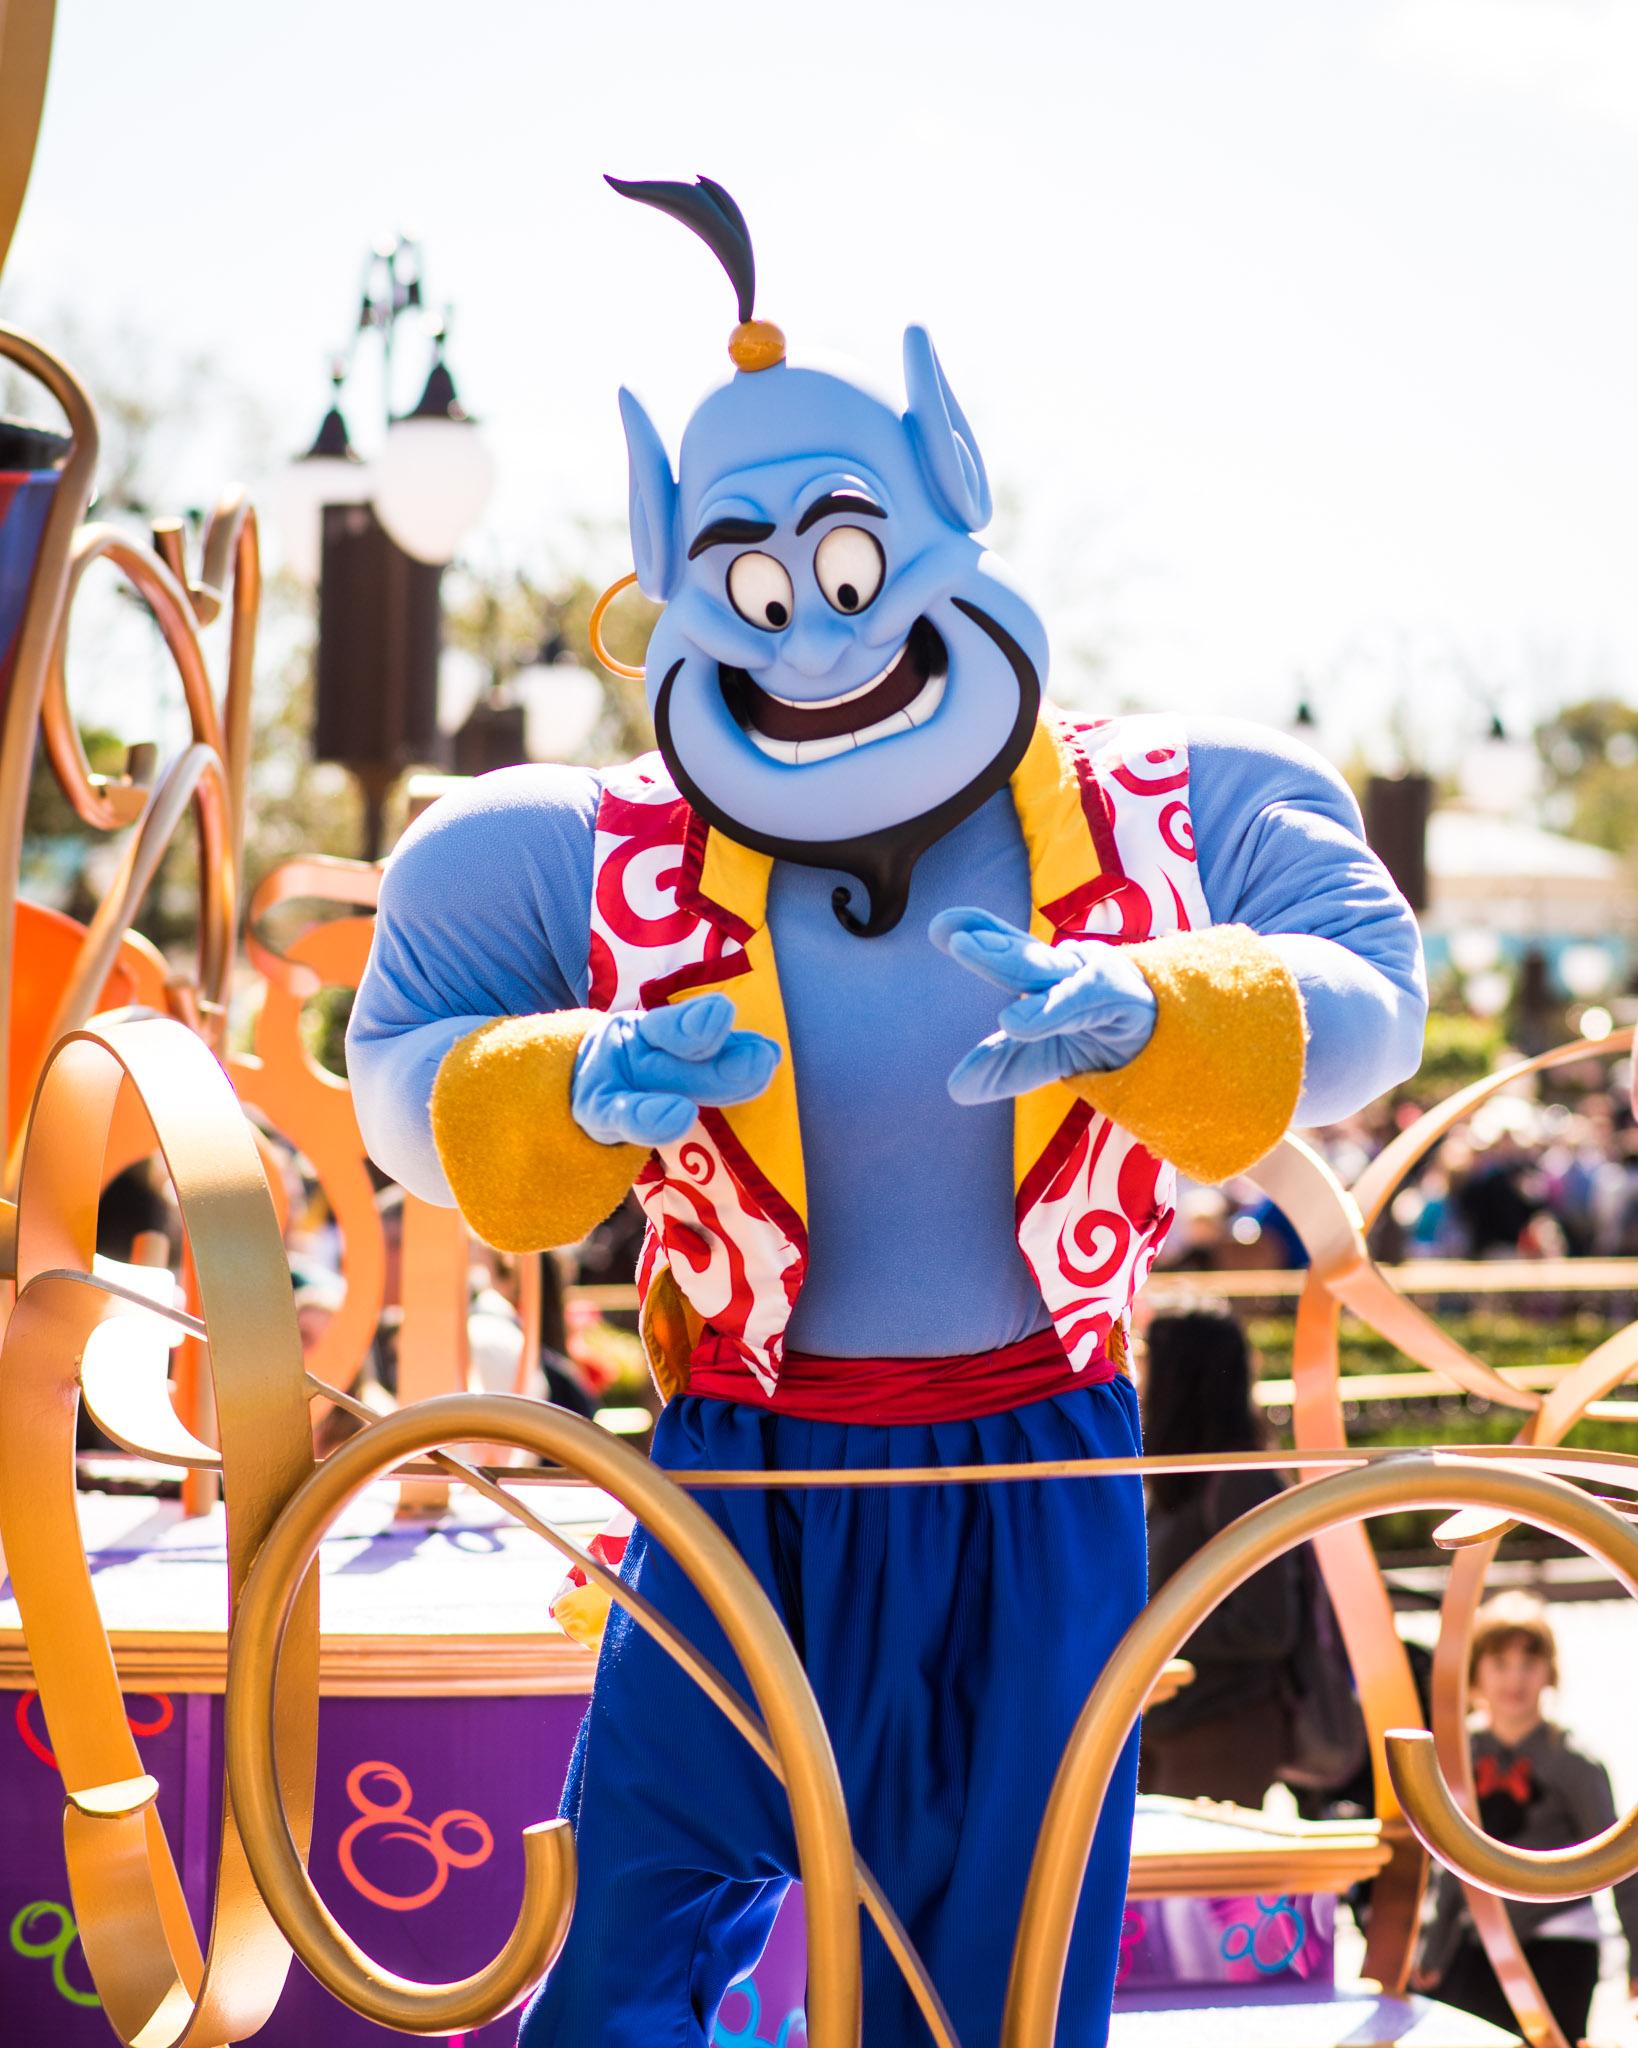 Aladdin Genie - Walt Disney World Magic Kingdom